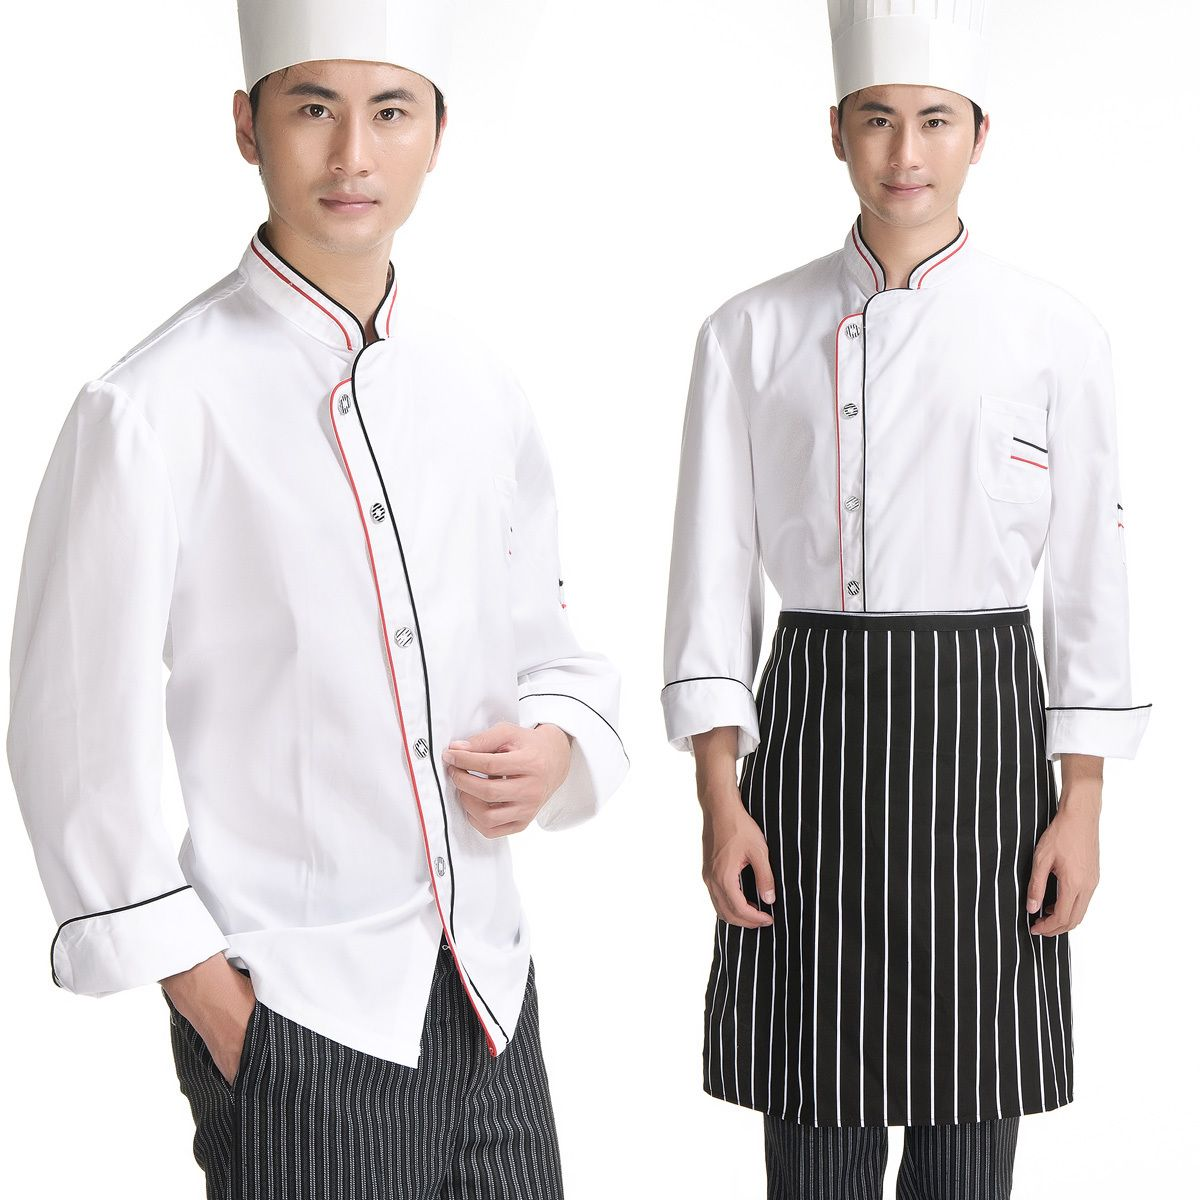 041491302 Bartender Uniforms | Hotel Overalls Waiter Uniform Bartenders Work Shirt  Tooling